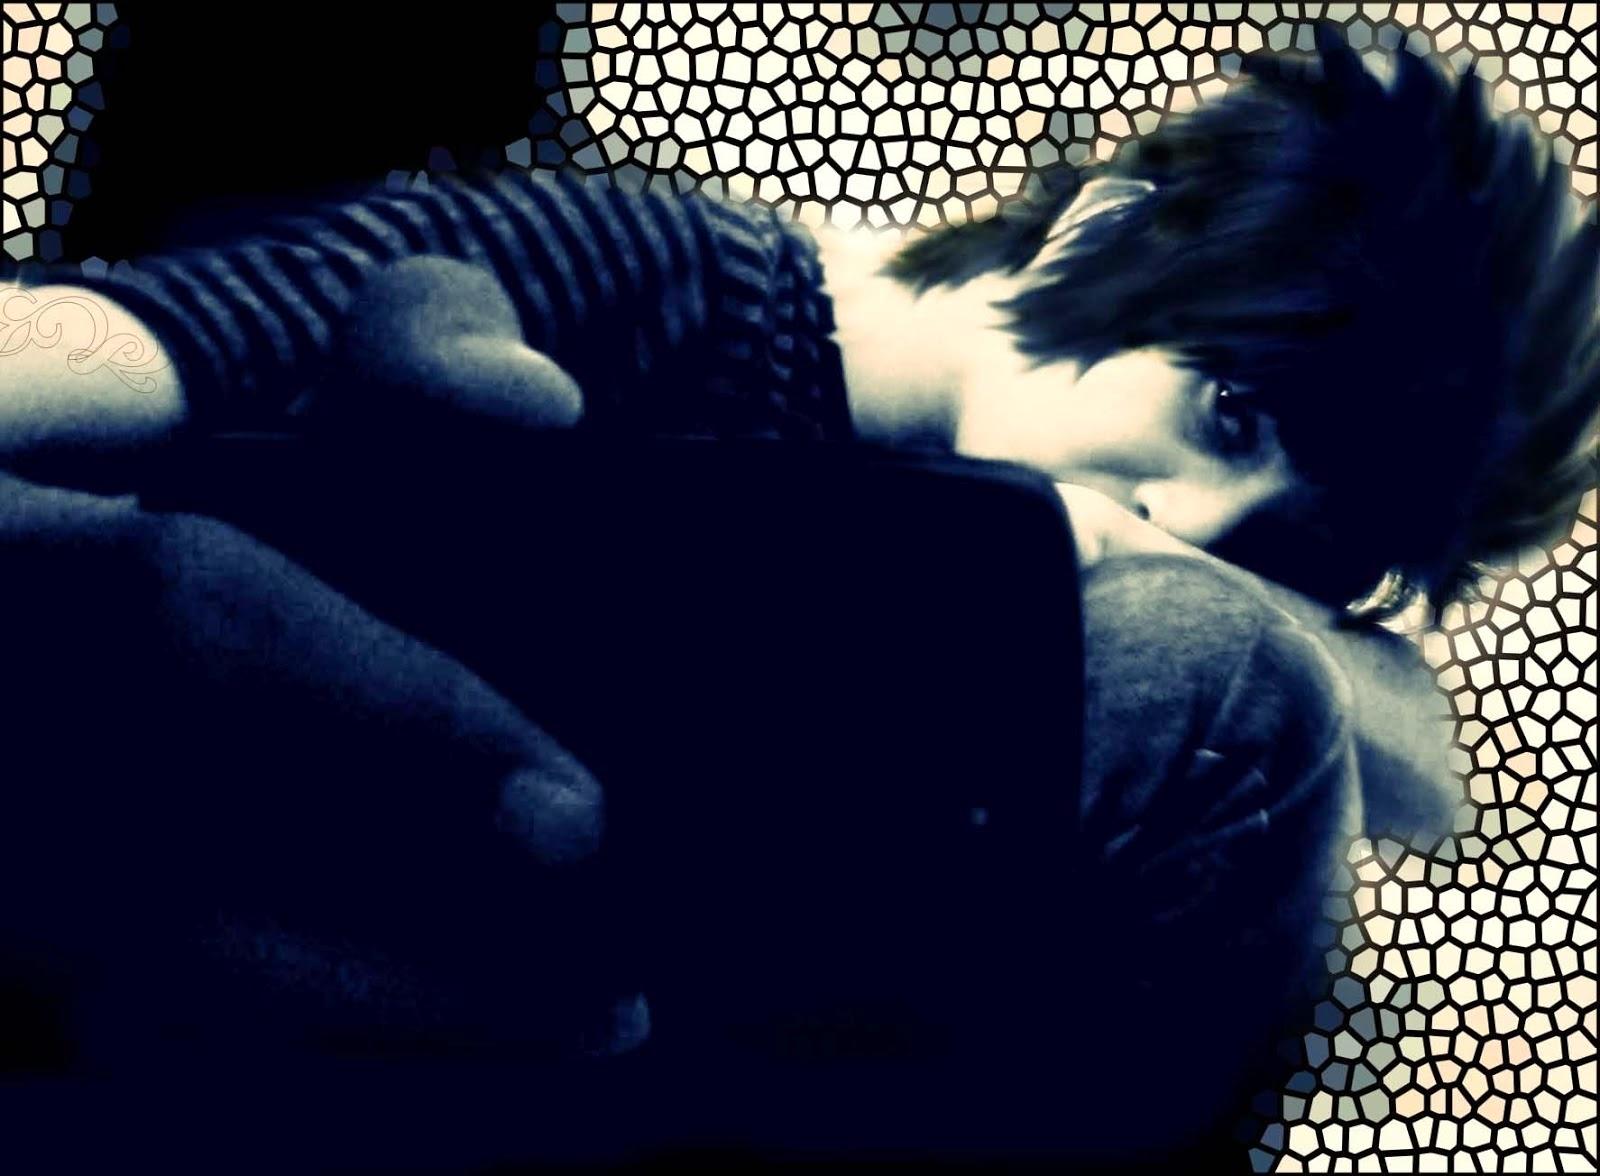 Sad boys wallpapers cute sad boys in love - Sad love boy wallpaper download ...